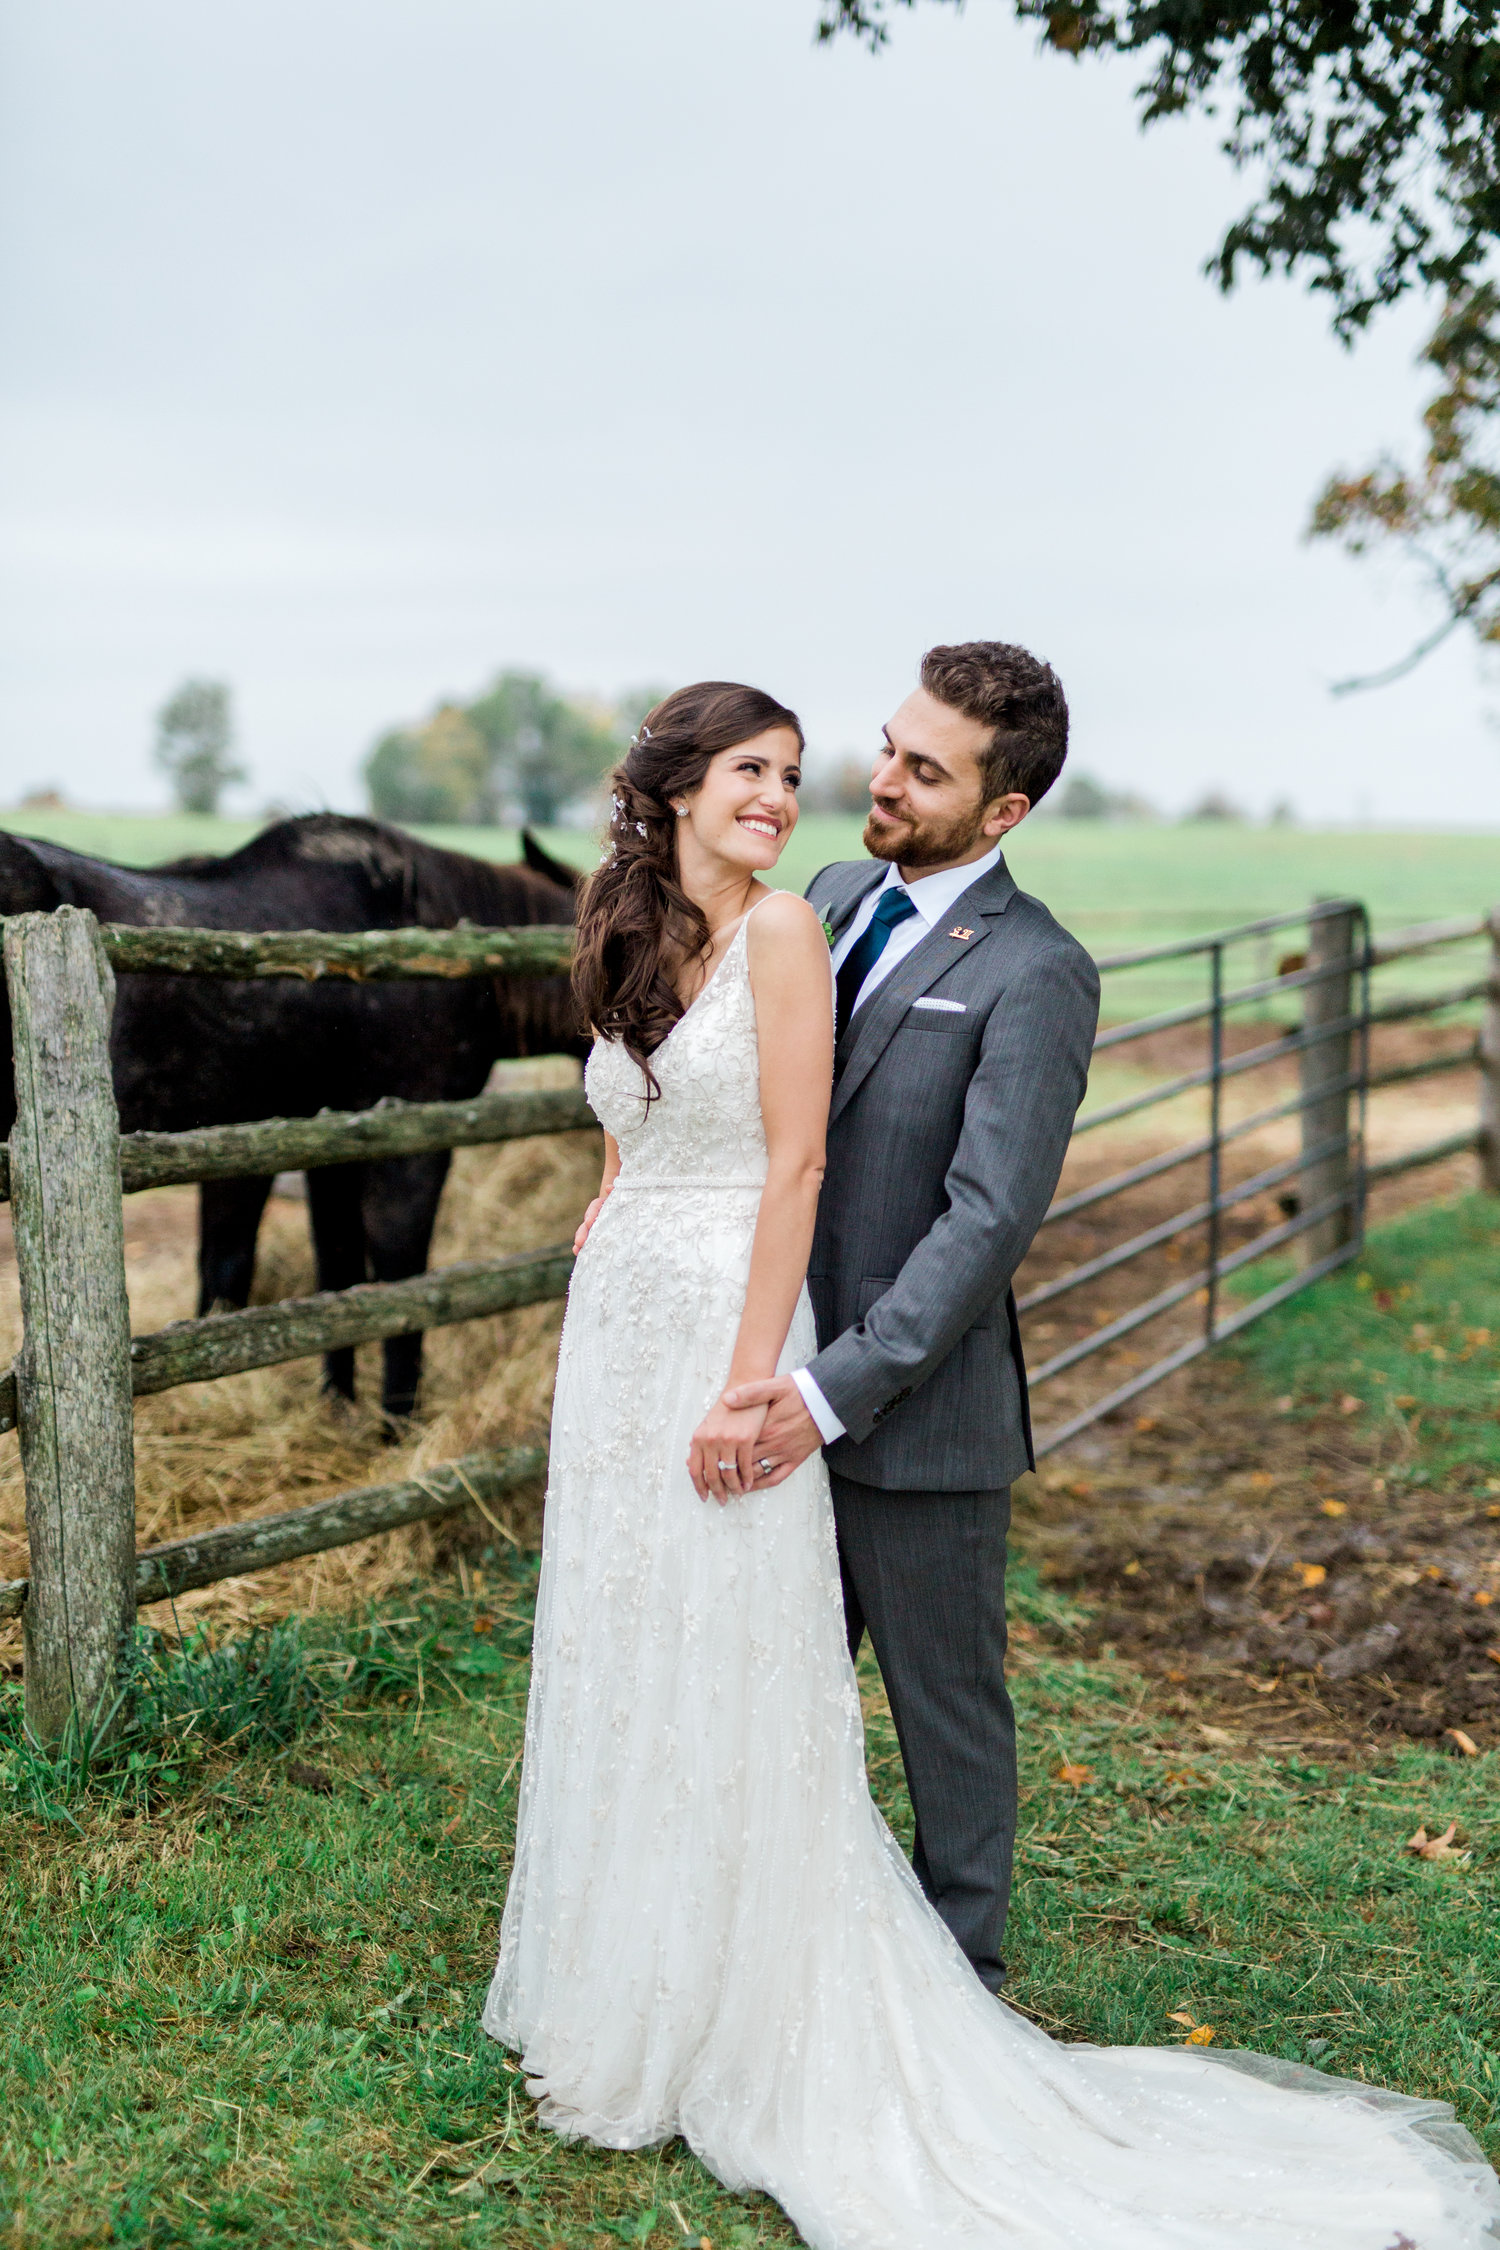 Amir-Golbazi-Danielle-Giroux-Photography_Toronto-Wedding_Cedarwood_Rachel-Paul_515.jpg